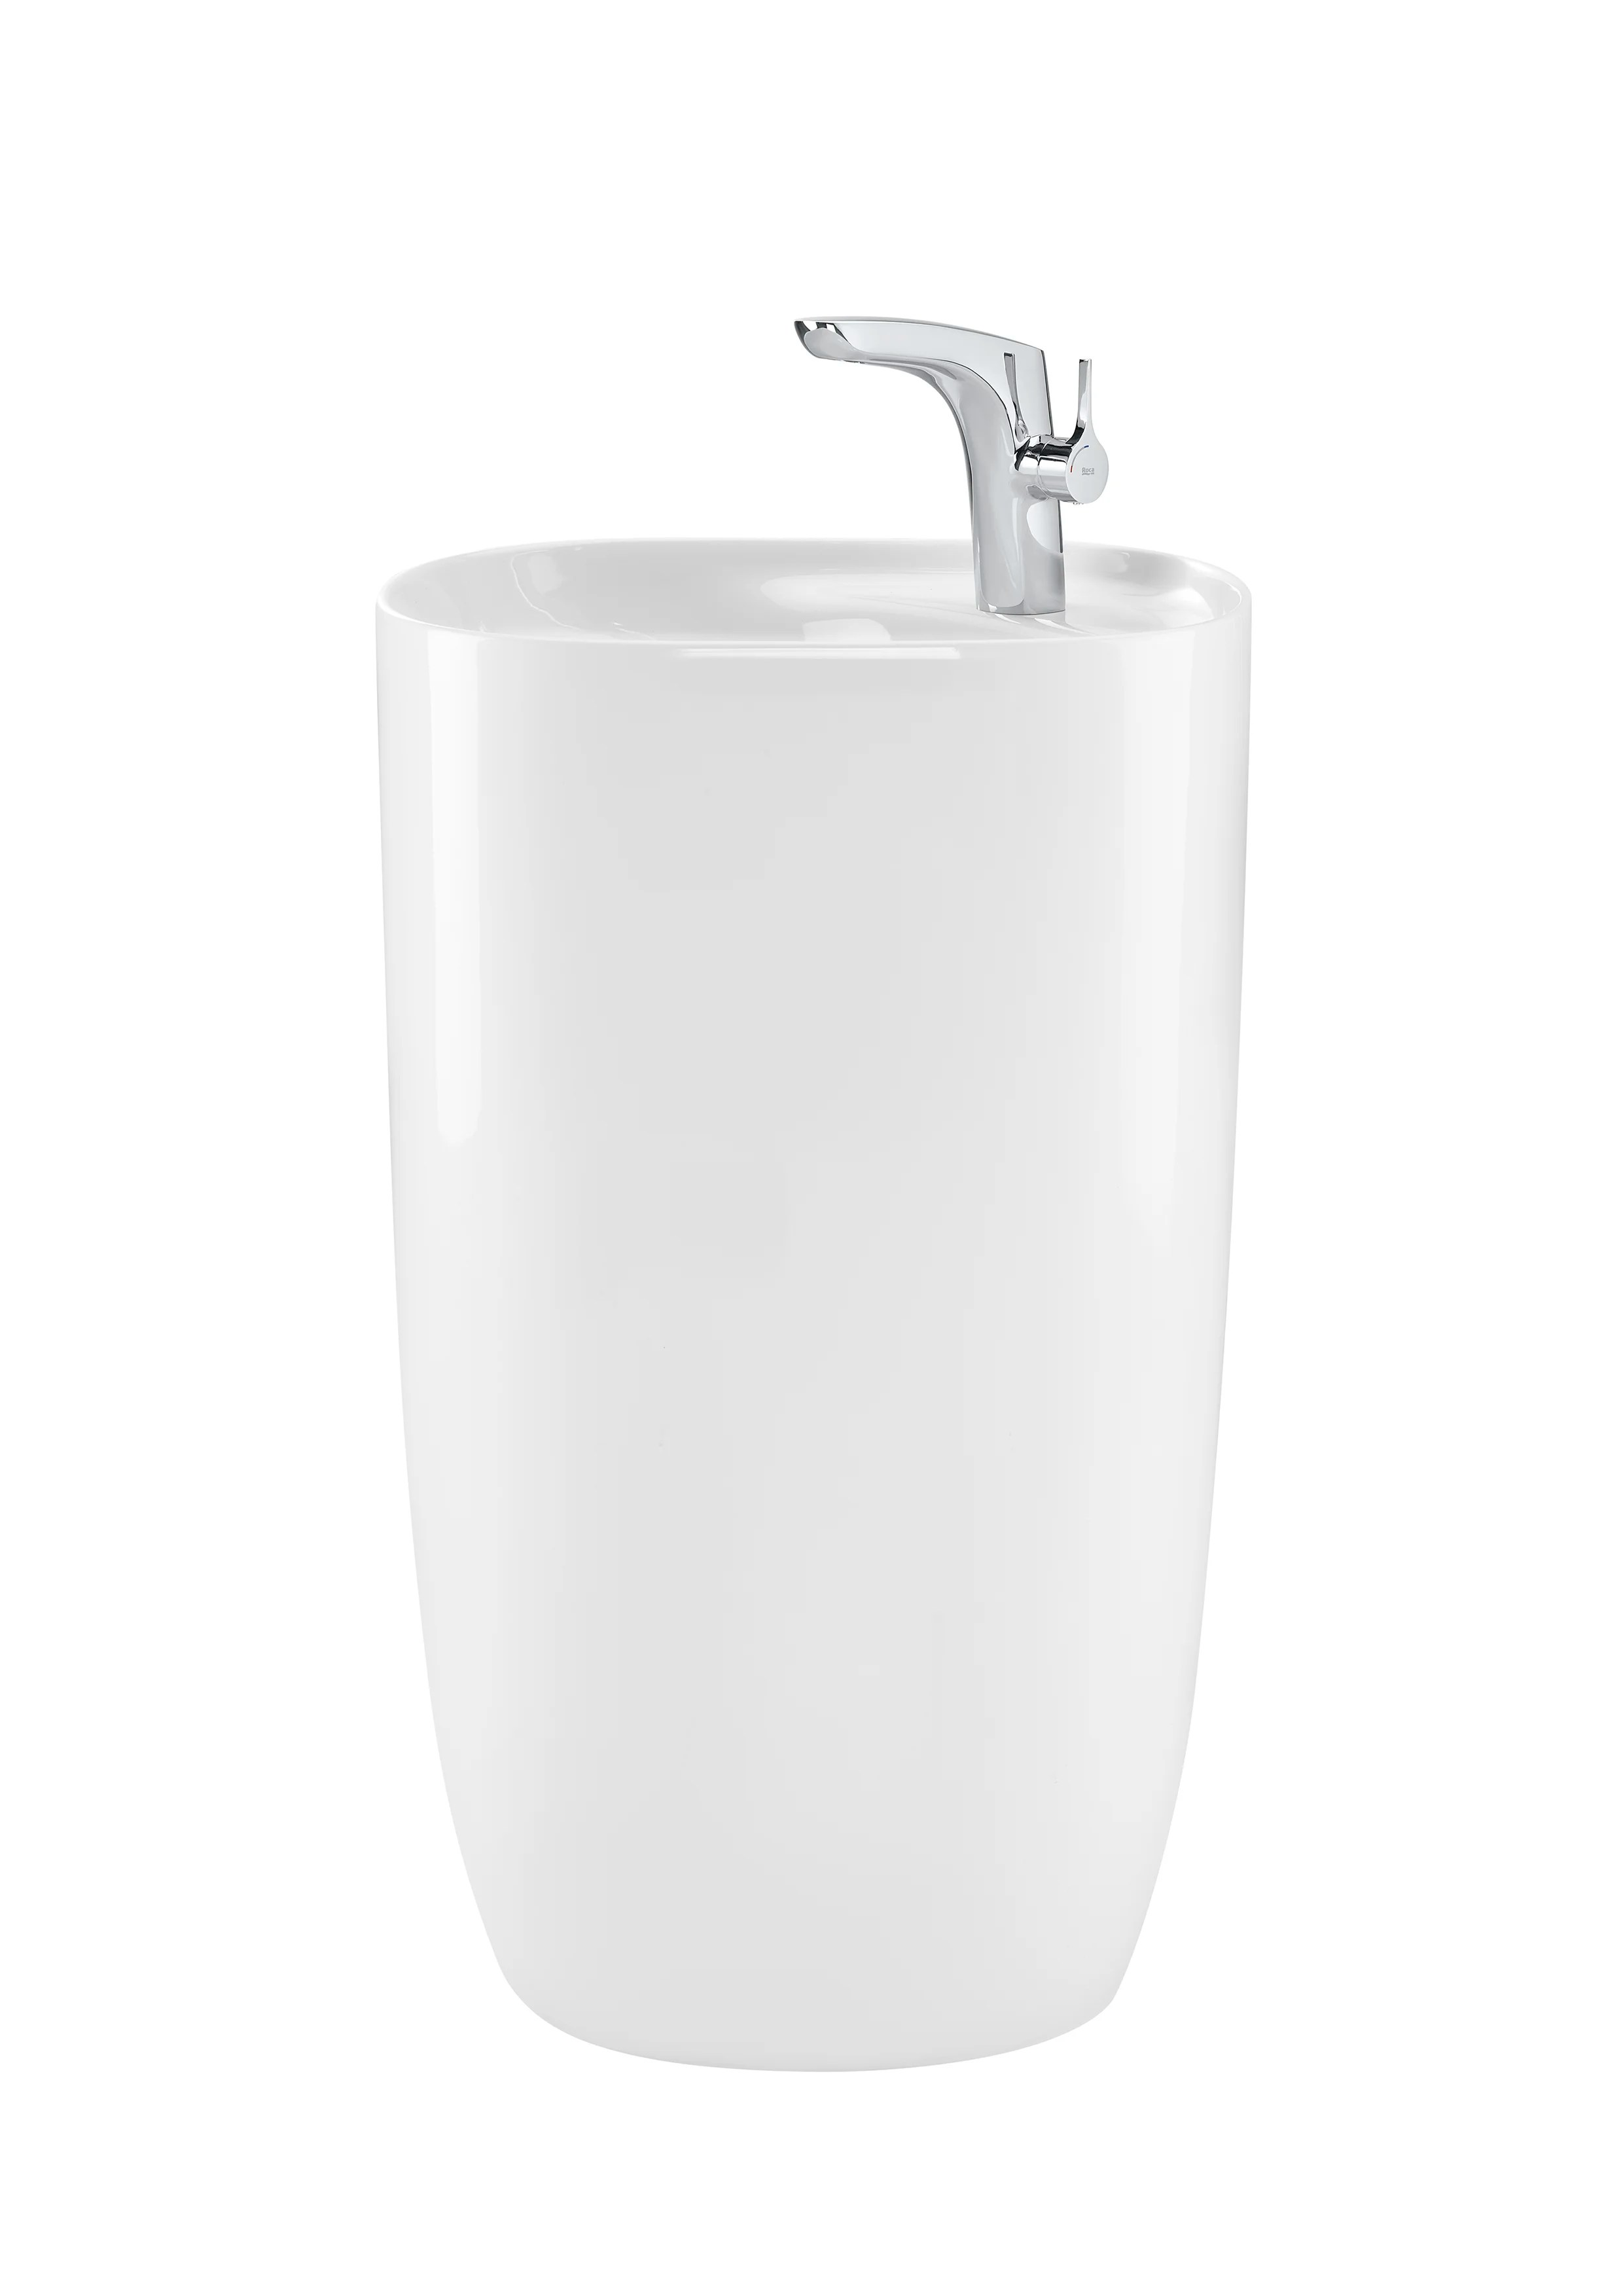 https www wayfair com home improvement pdp roca beyond glossy porcelain handmade oval pedestal bathroom sink hjal1002 html